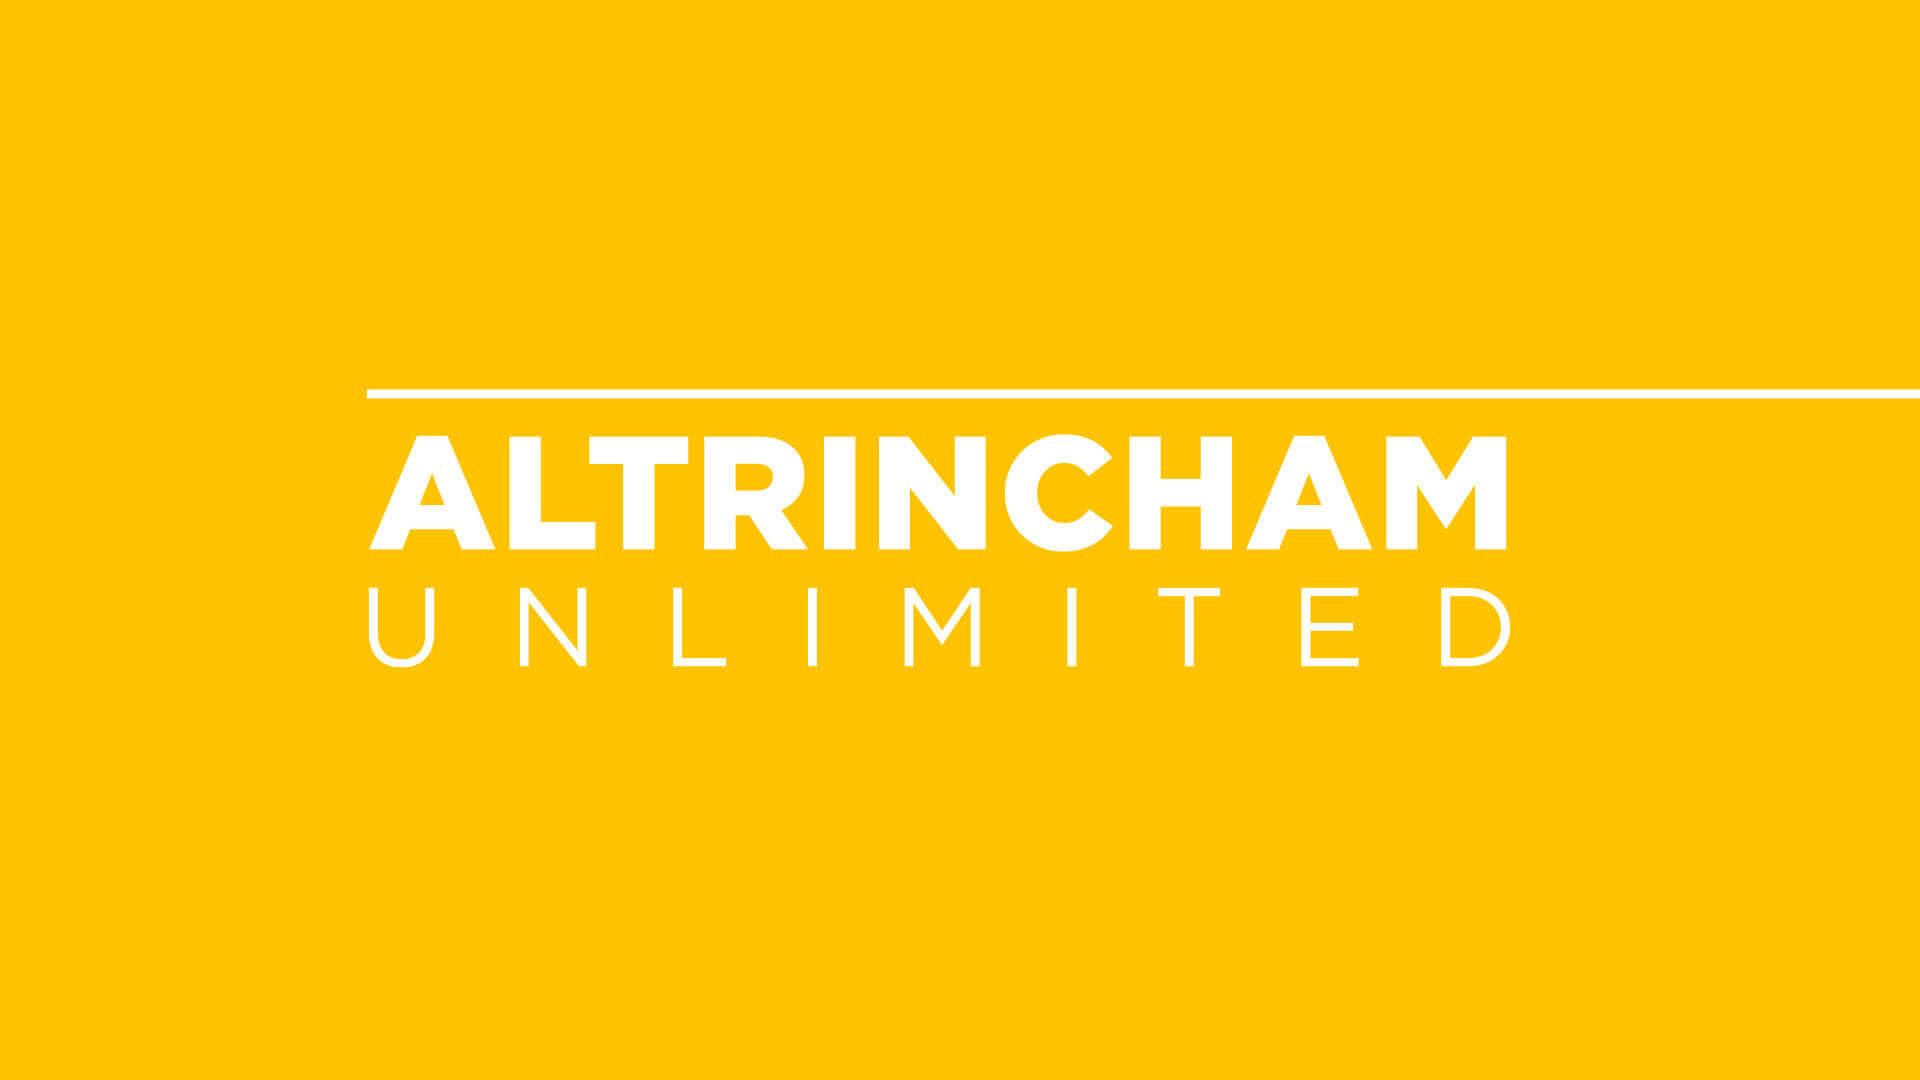 Altrincham Unlimited image